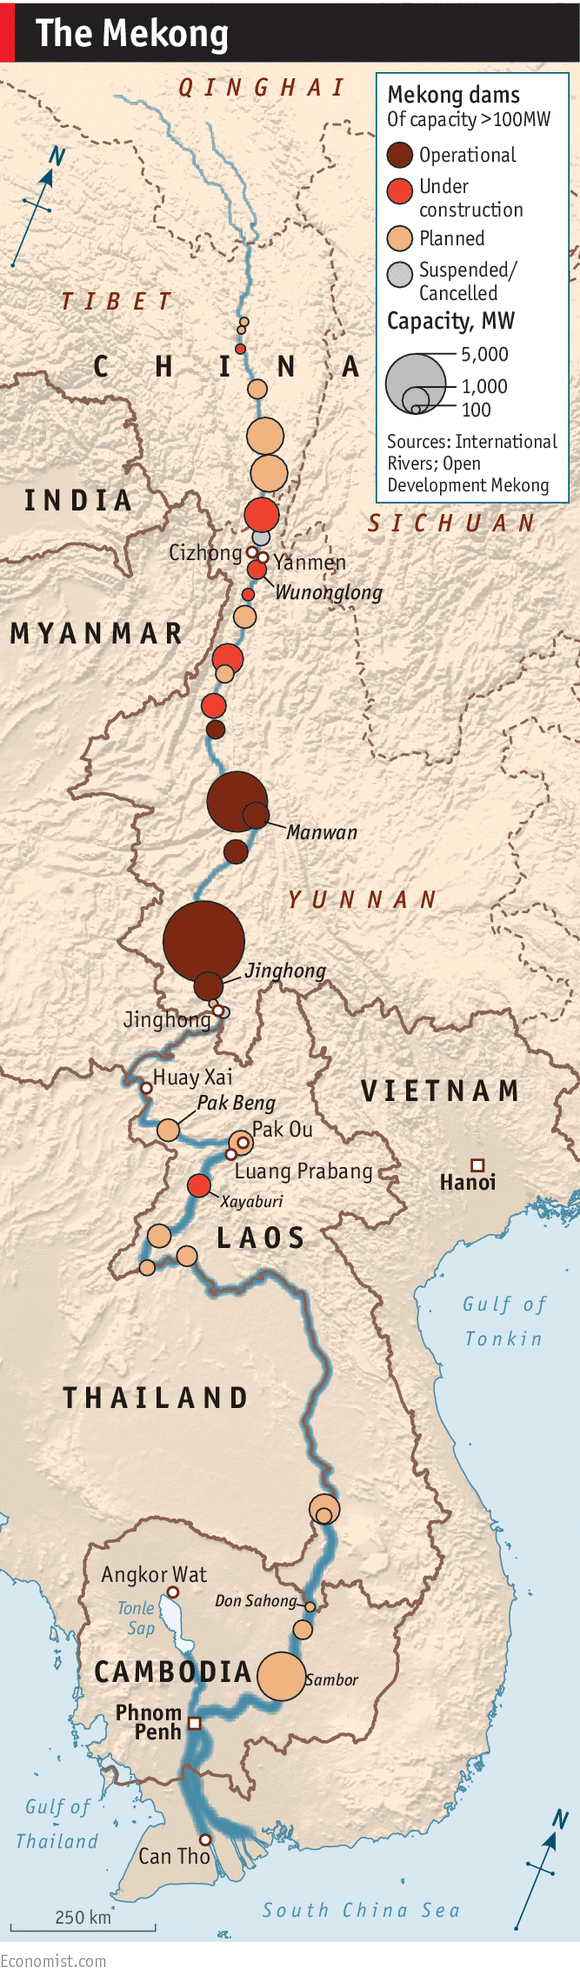 The proliferation of dams along the Mekong river - Daily chart